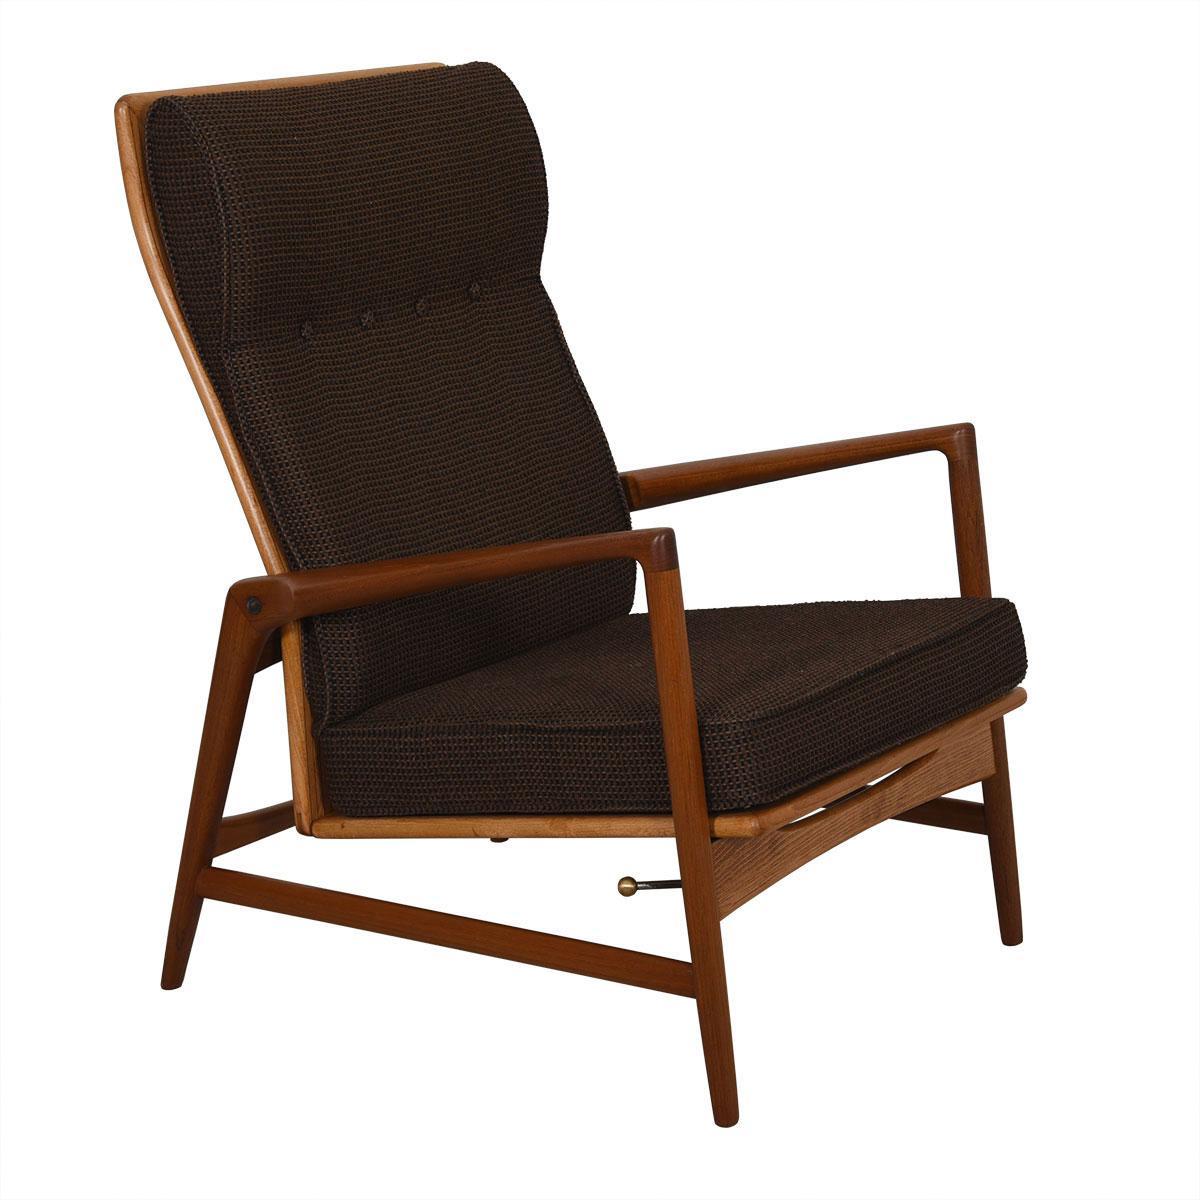 Kofod Larsen Danish Modern Teak Adjustable Lounge Chair With Ottoman    Image 2 Of 10